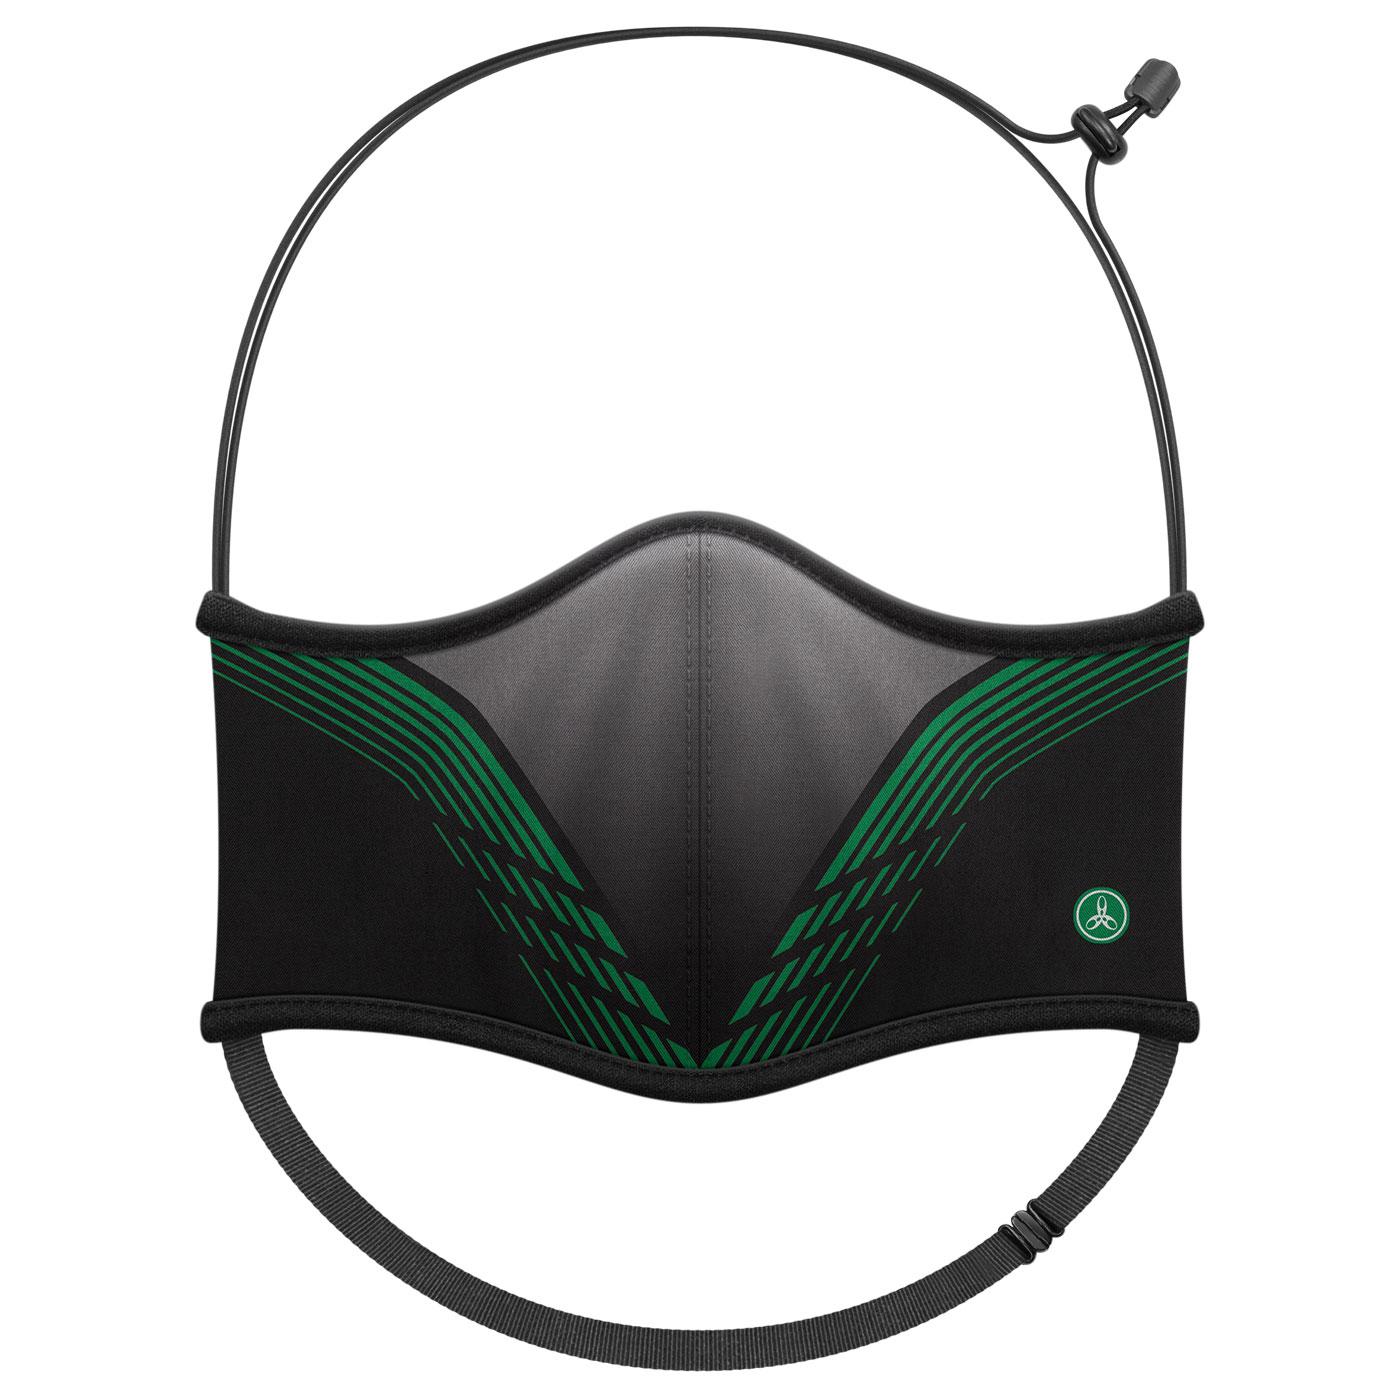 HODARLA 運動舒適口罩6032213 - 黑綠灰